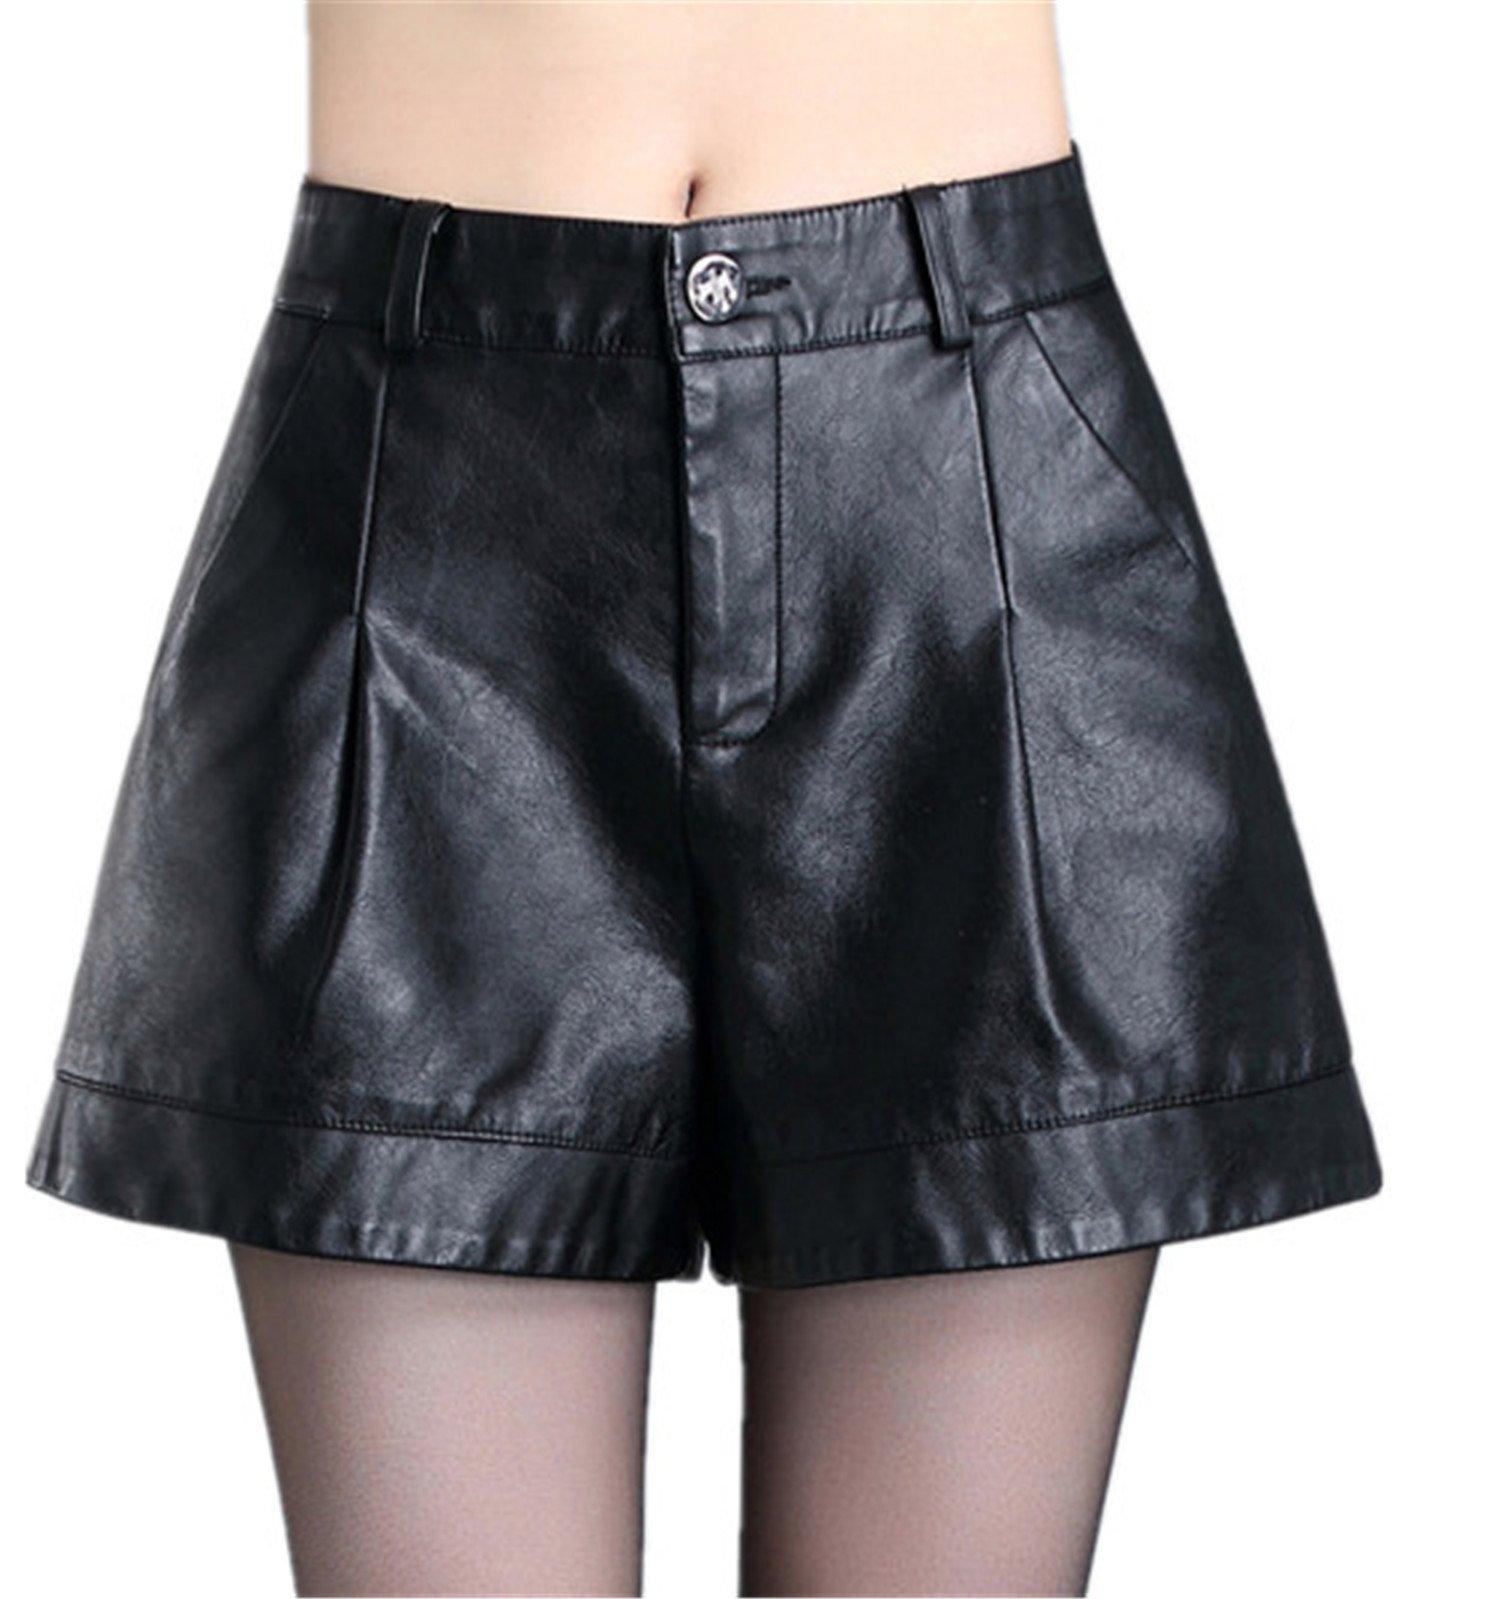 Stephanie Fashion Casual Women Pu Leather Shorts New Slim Shorts Female Boots Shorts M